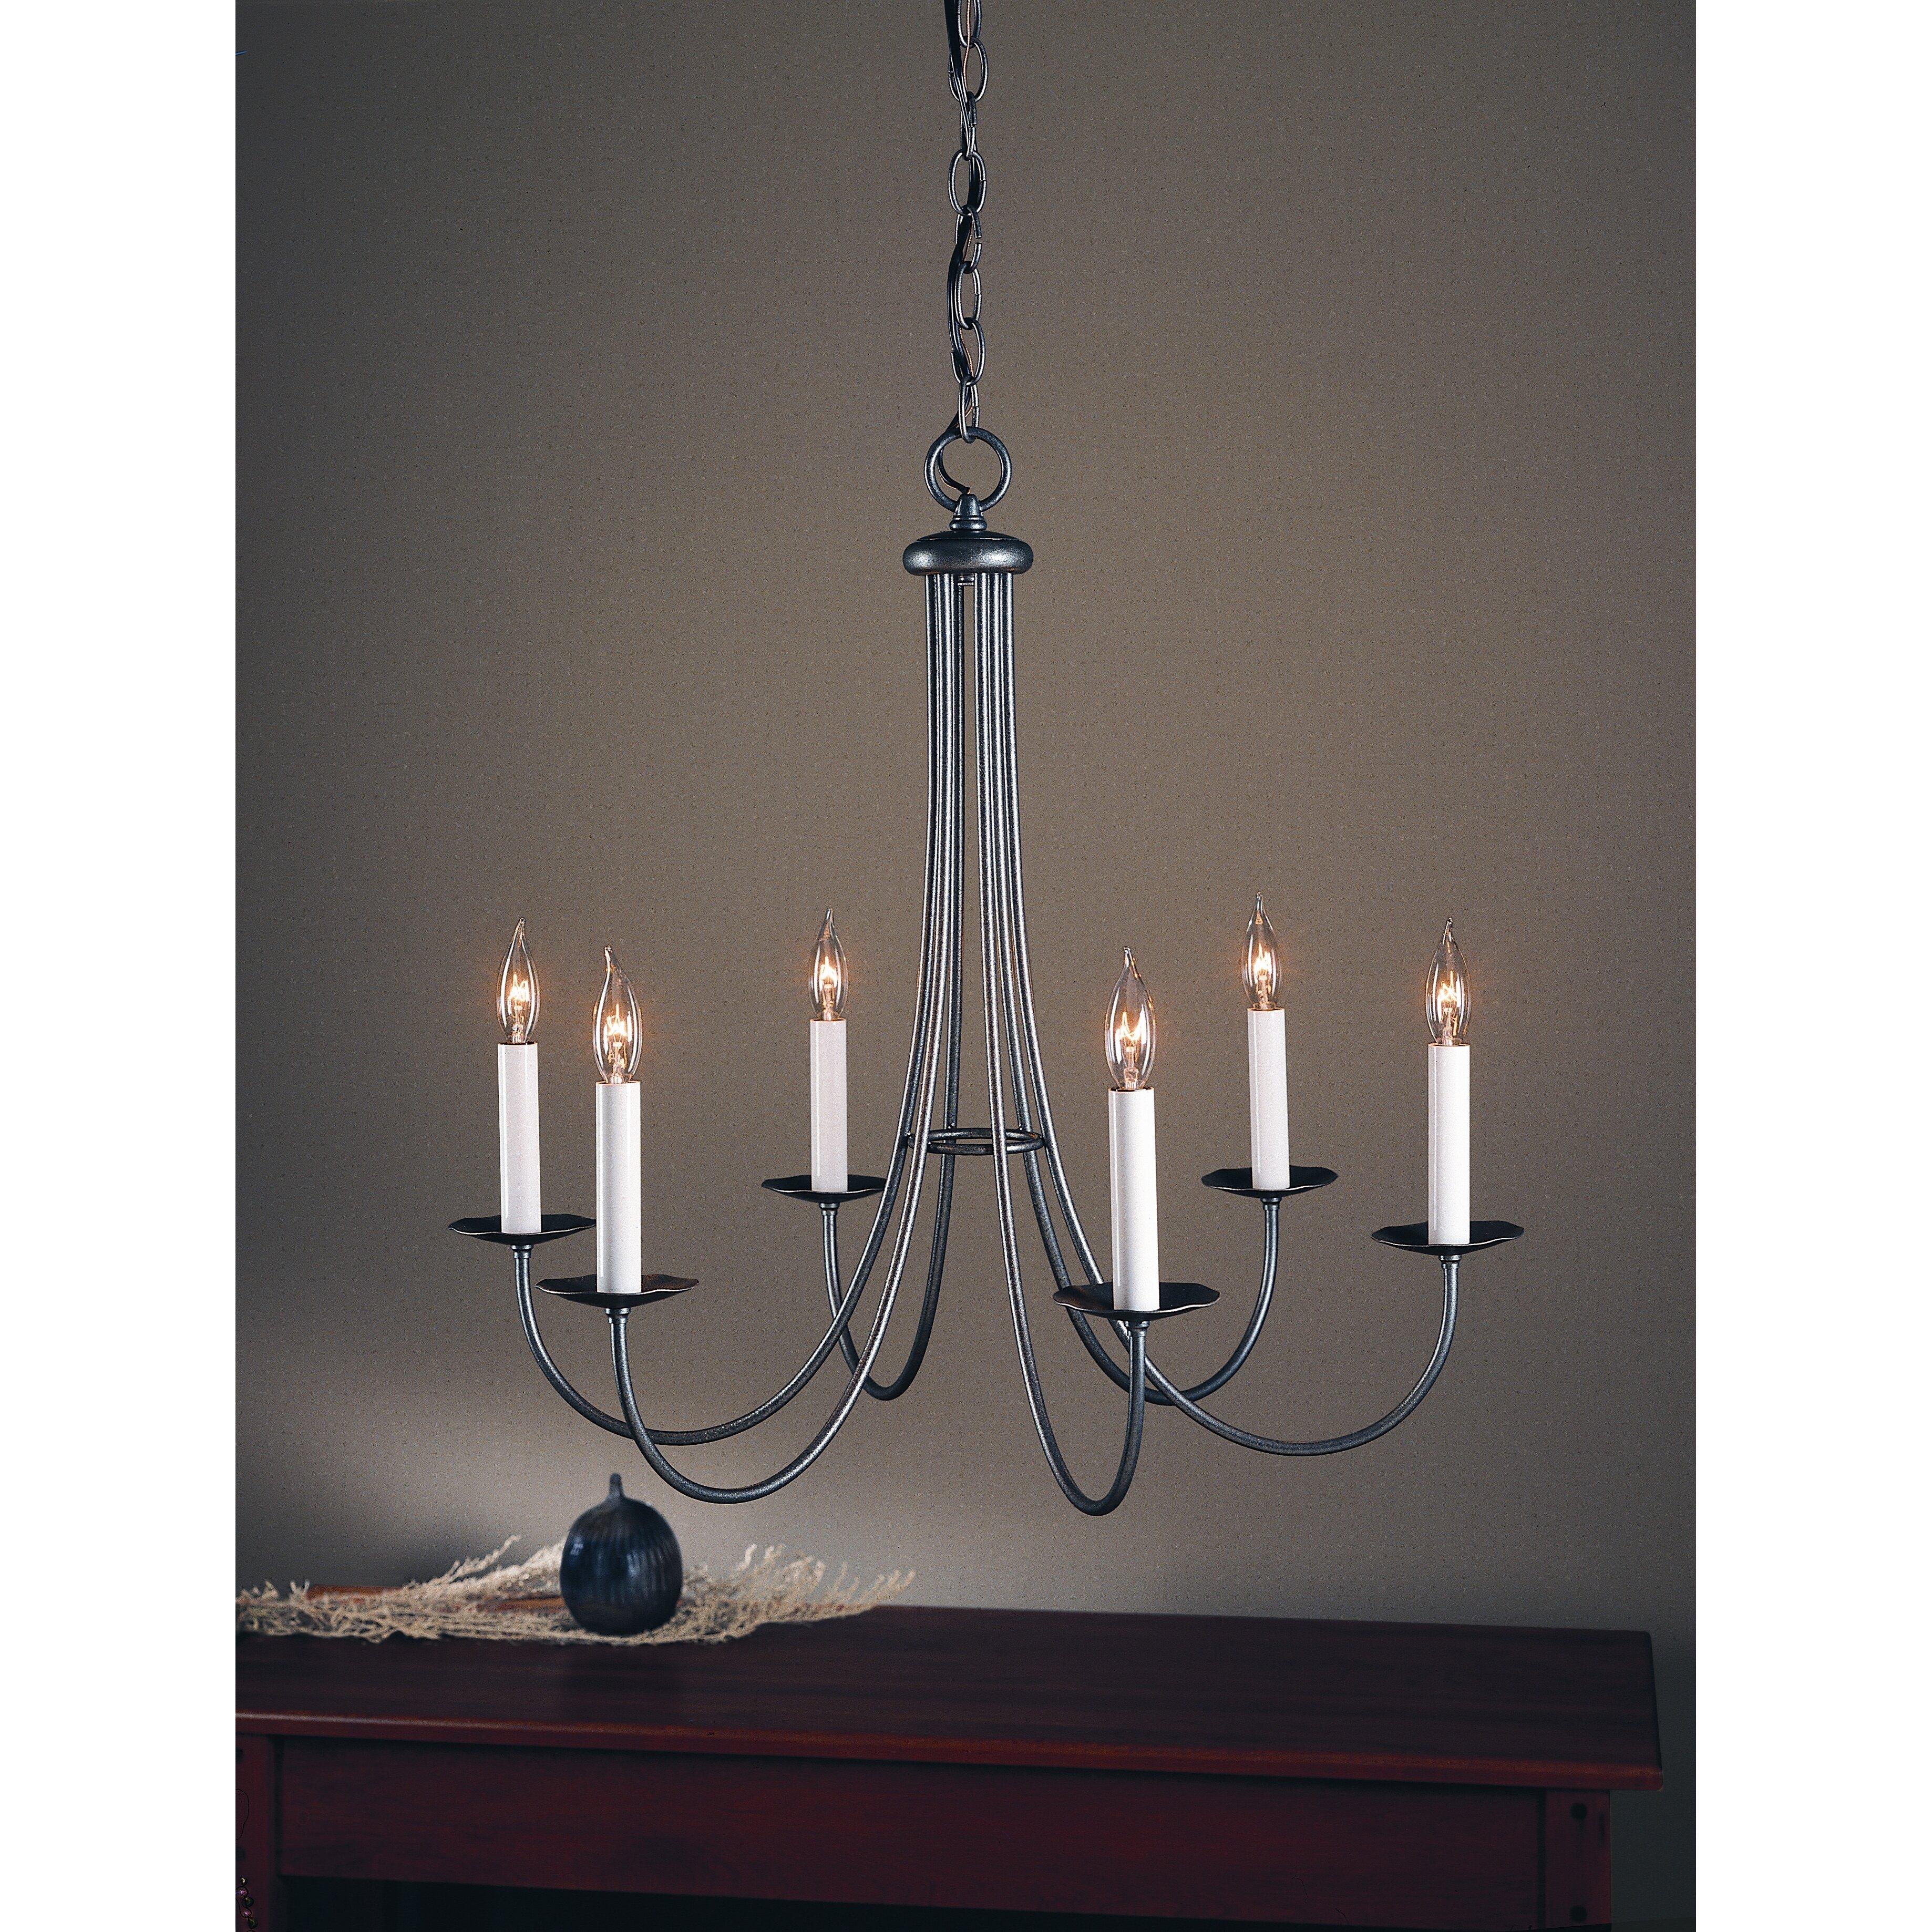 Hubbardton forge simple sweep 6 light chandelier reviews wayfair for Hubbardton forge bathroom lighting